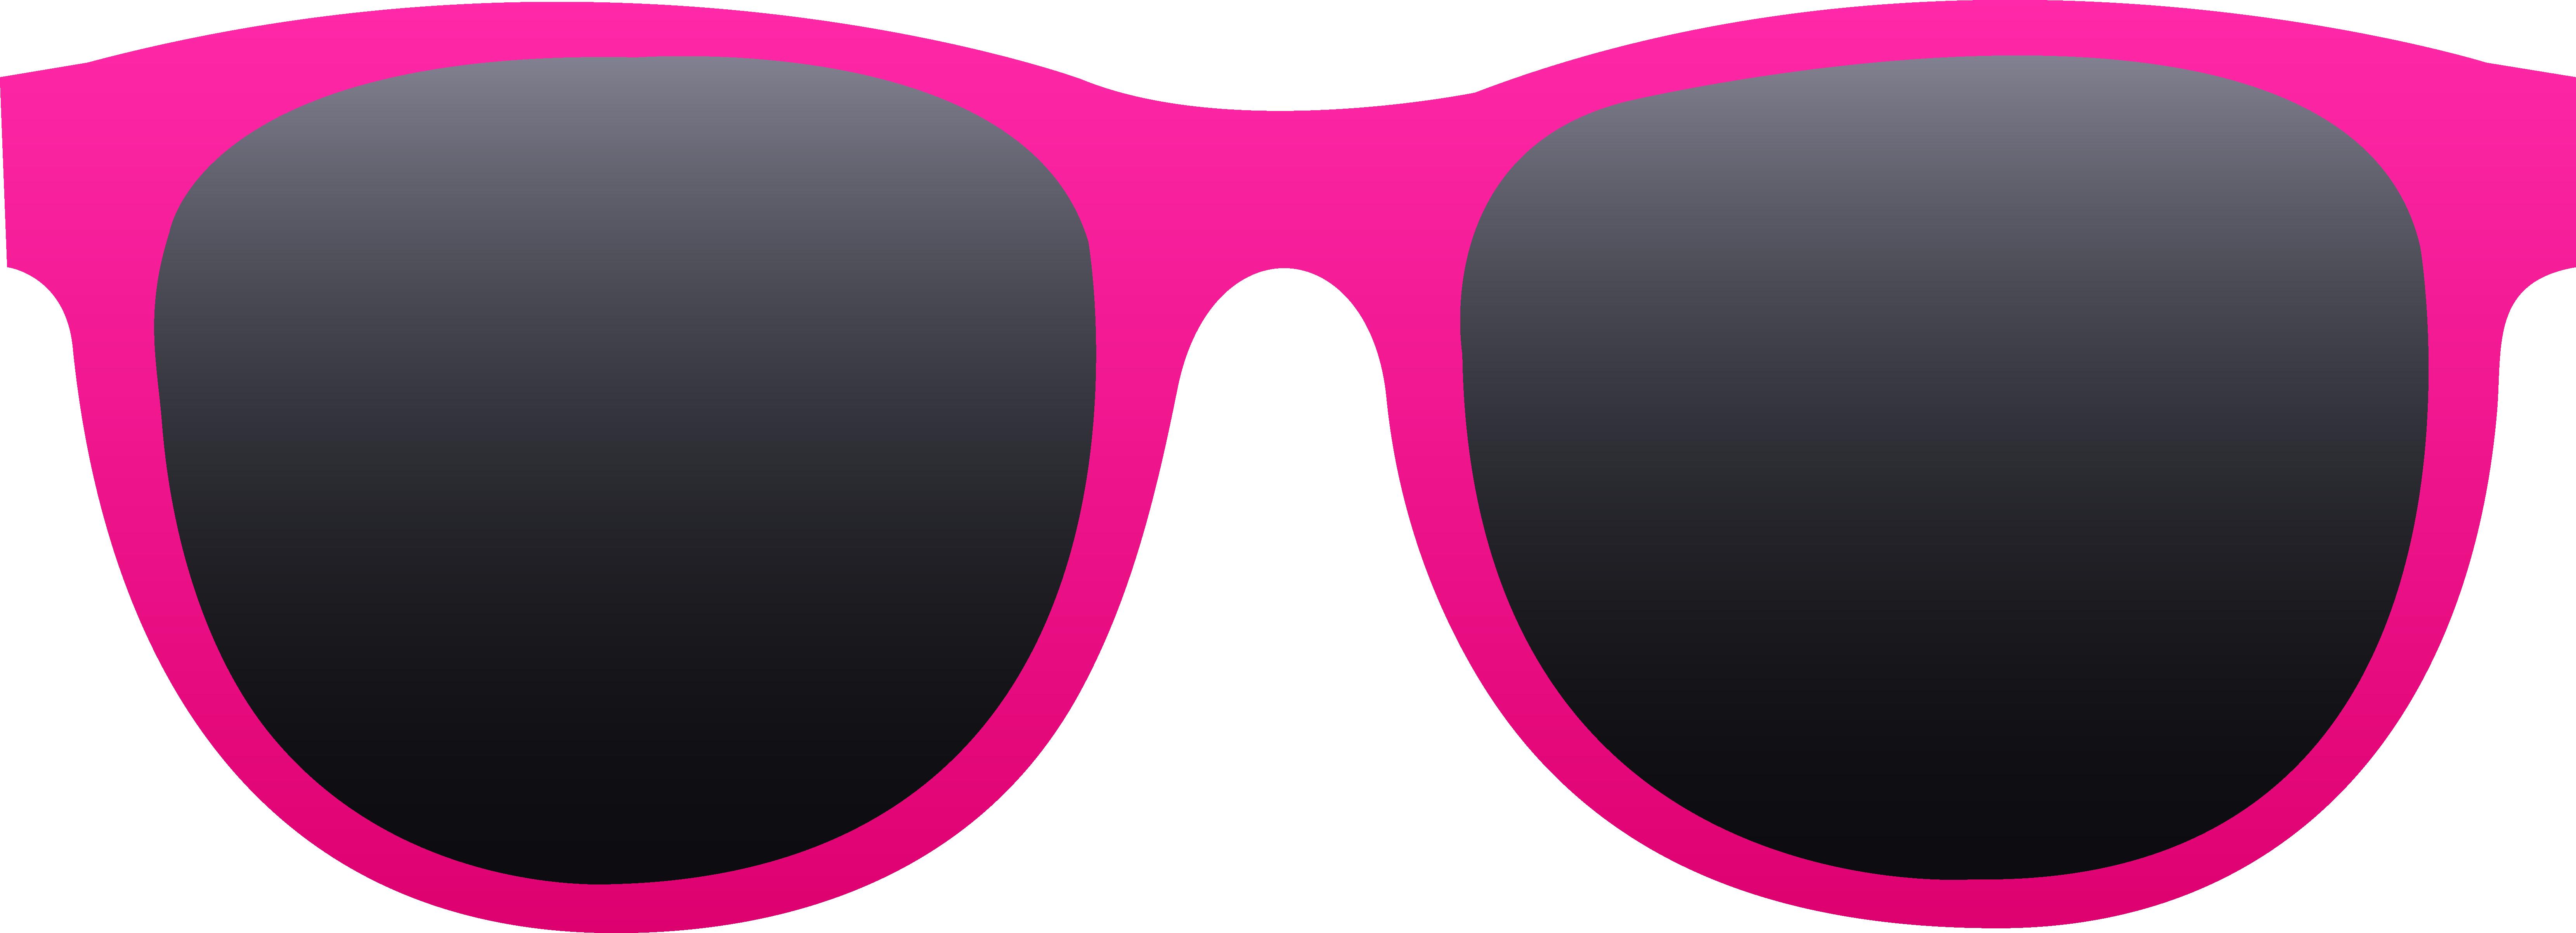 sunglasses clip art clipart panda free clipart images rh clipartpanda com sunglasses clip art to print free sunglasses clip art free